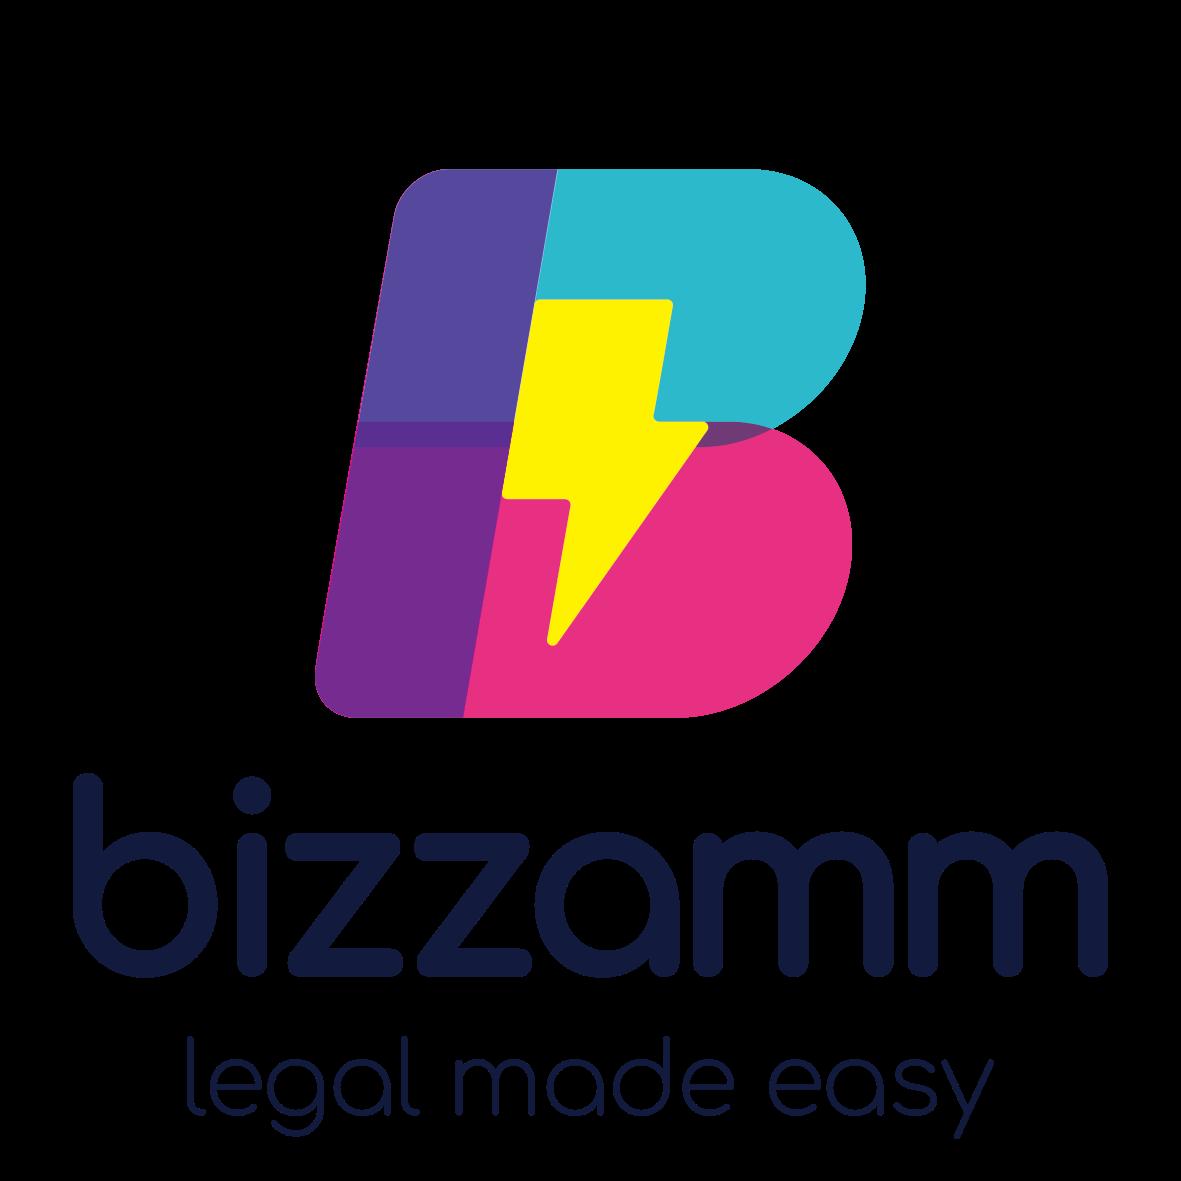 Bizzamm